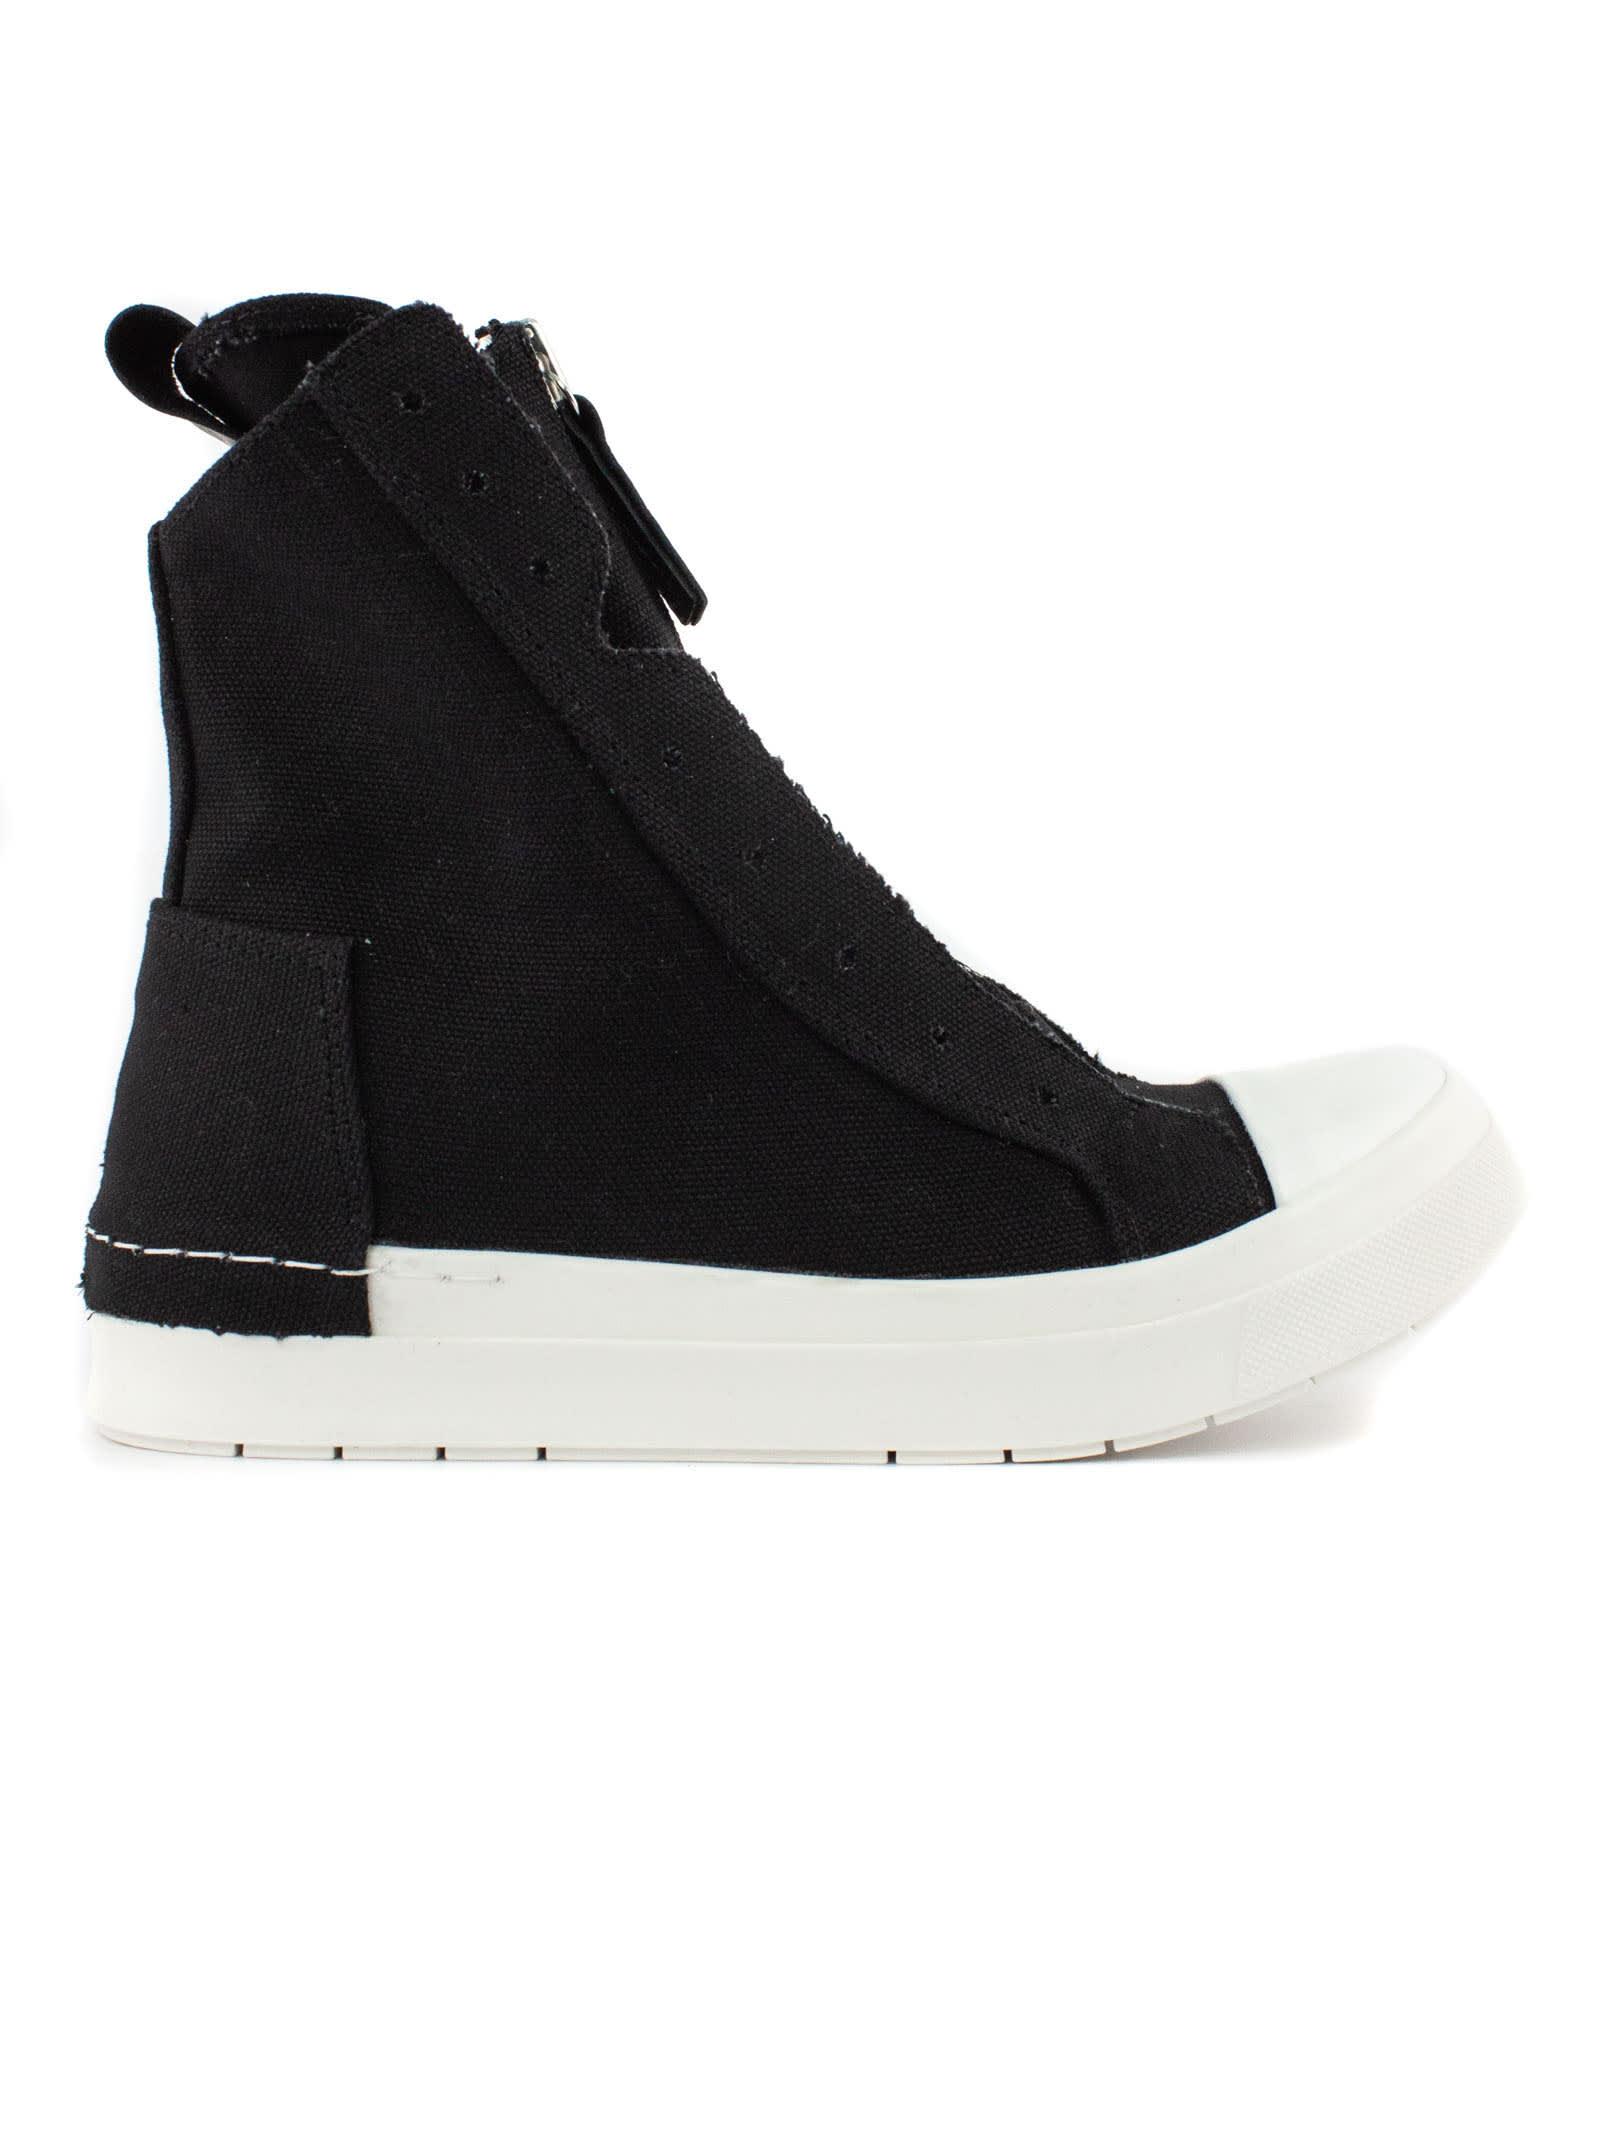 High-top Sneaker In Black Cotton